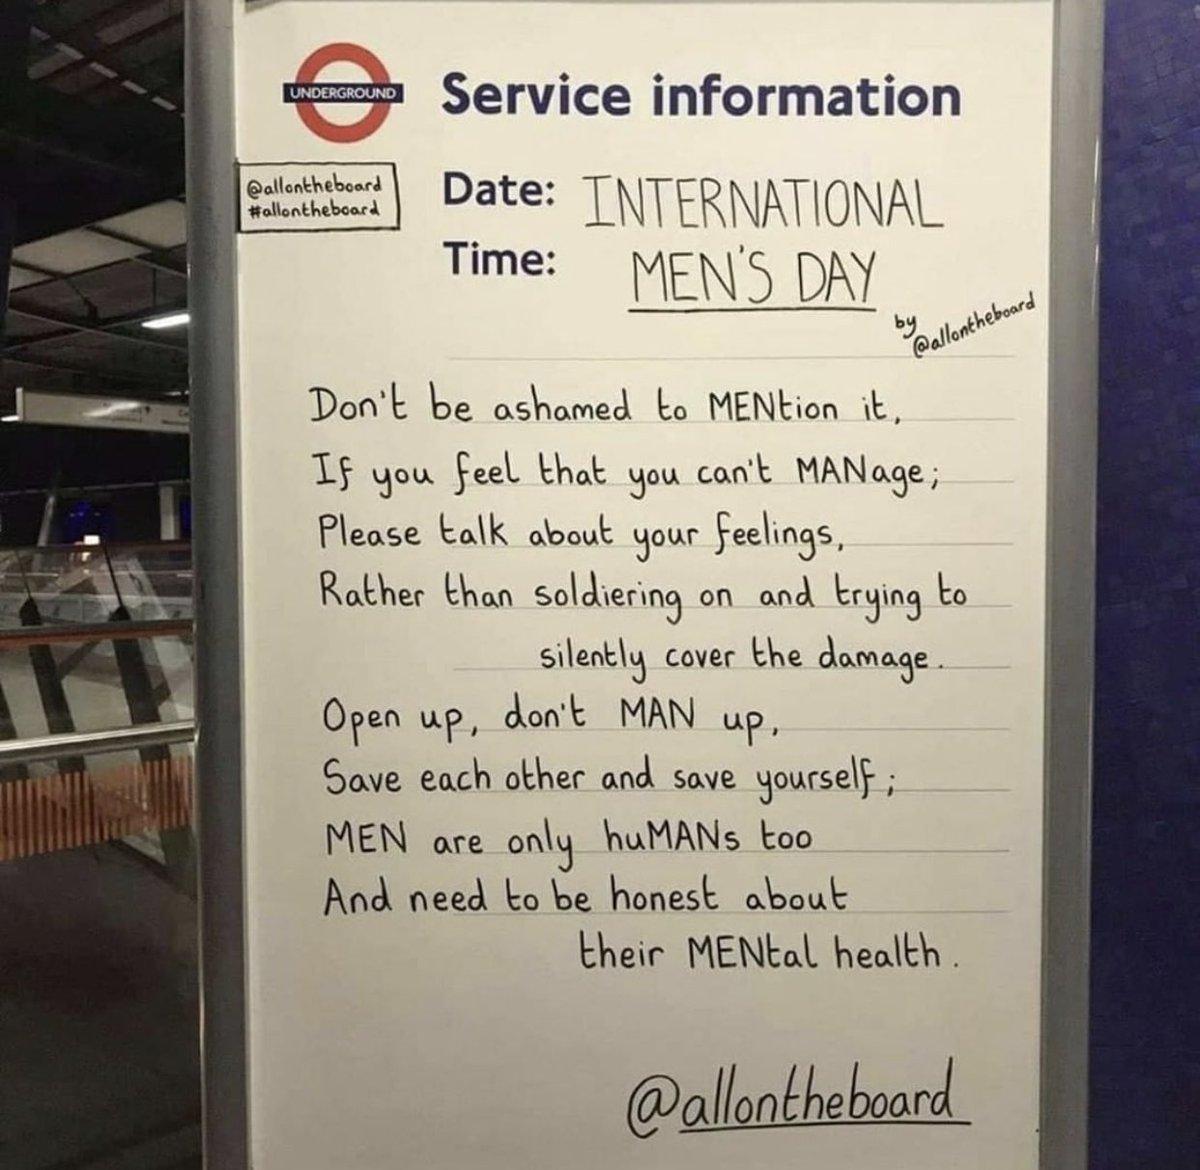 #InternationalMensDay ♥️